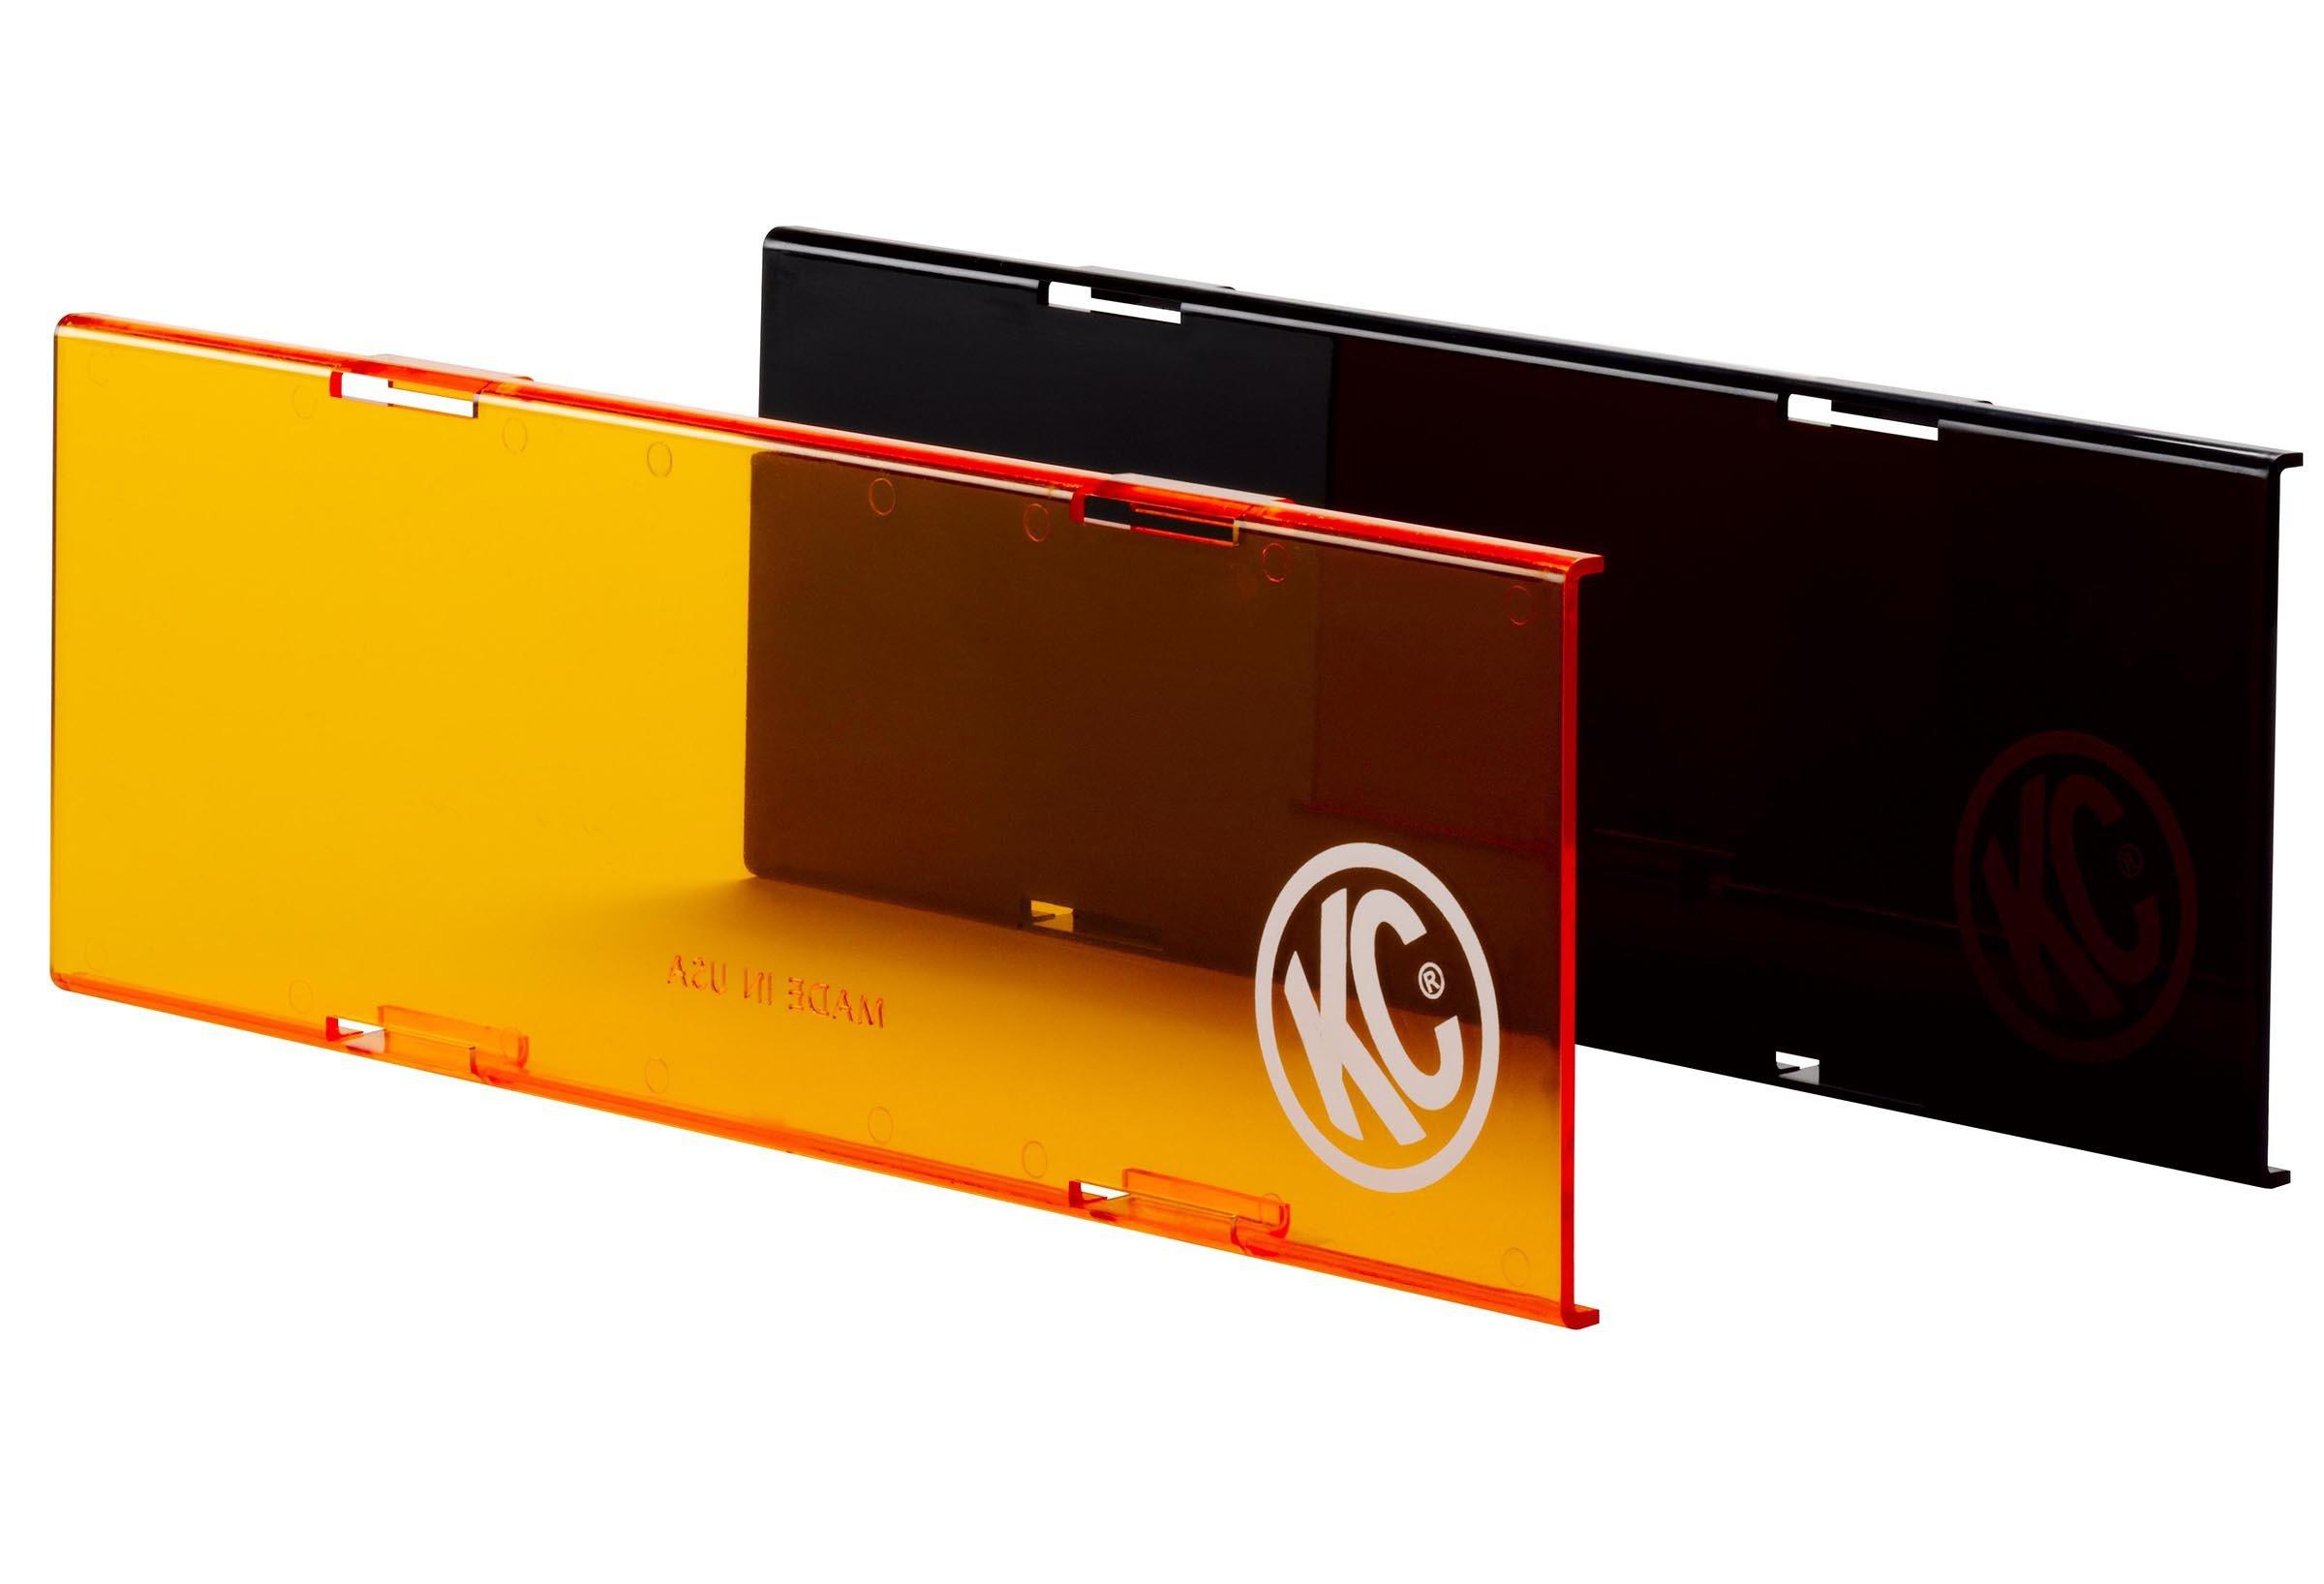 Kc Hilites 10 Quot Acrylics Light Shield Cover